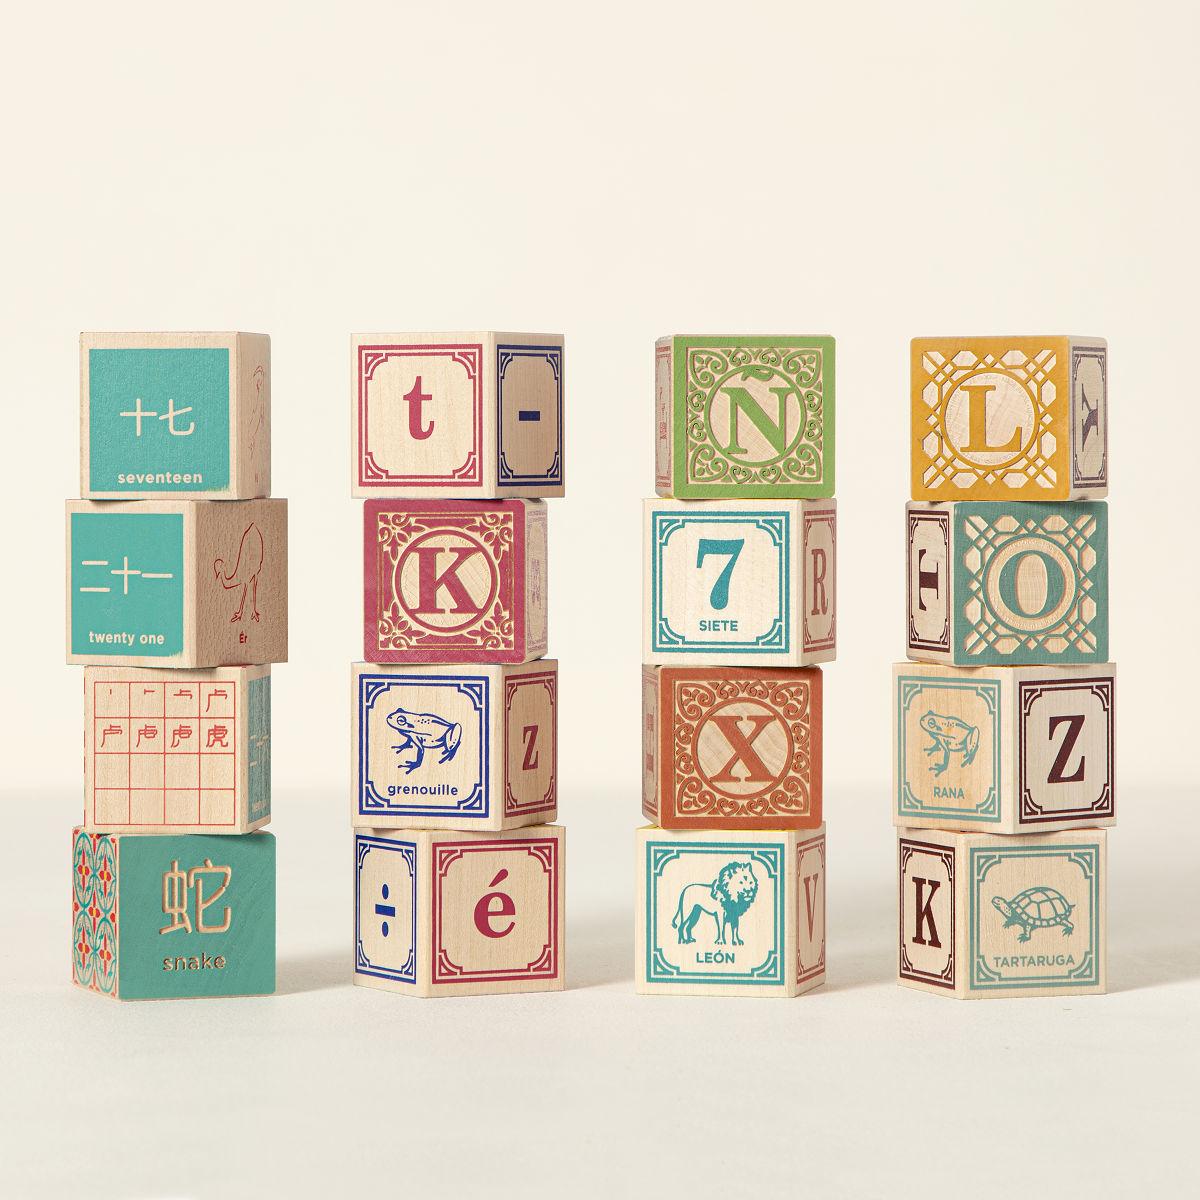 Foreign Language Blocks | Spanish, Mandarin, Chinese, Alphabet ...Foreign Language Blocks 2 thumbnail